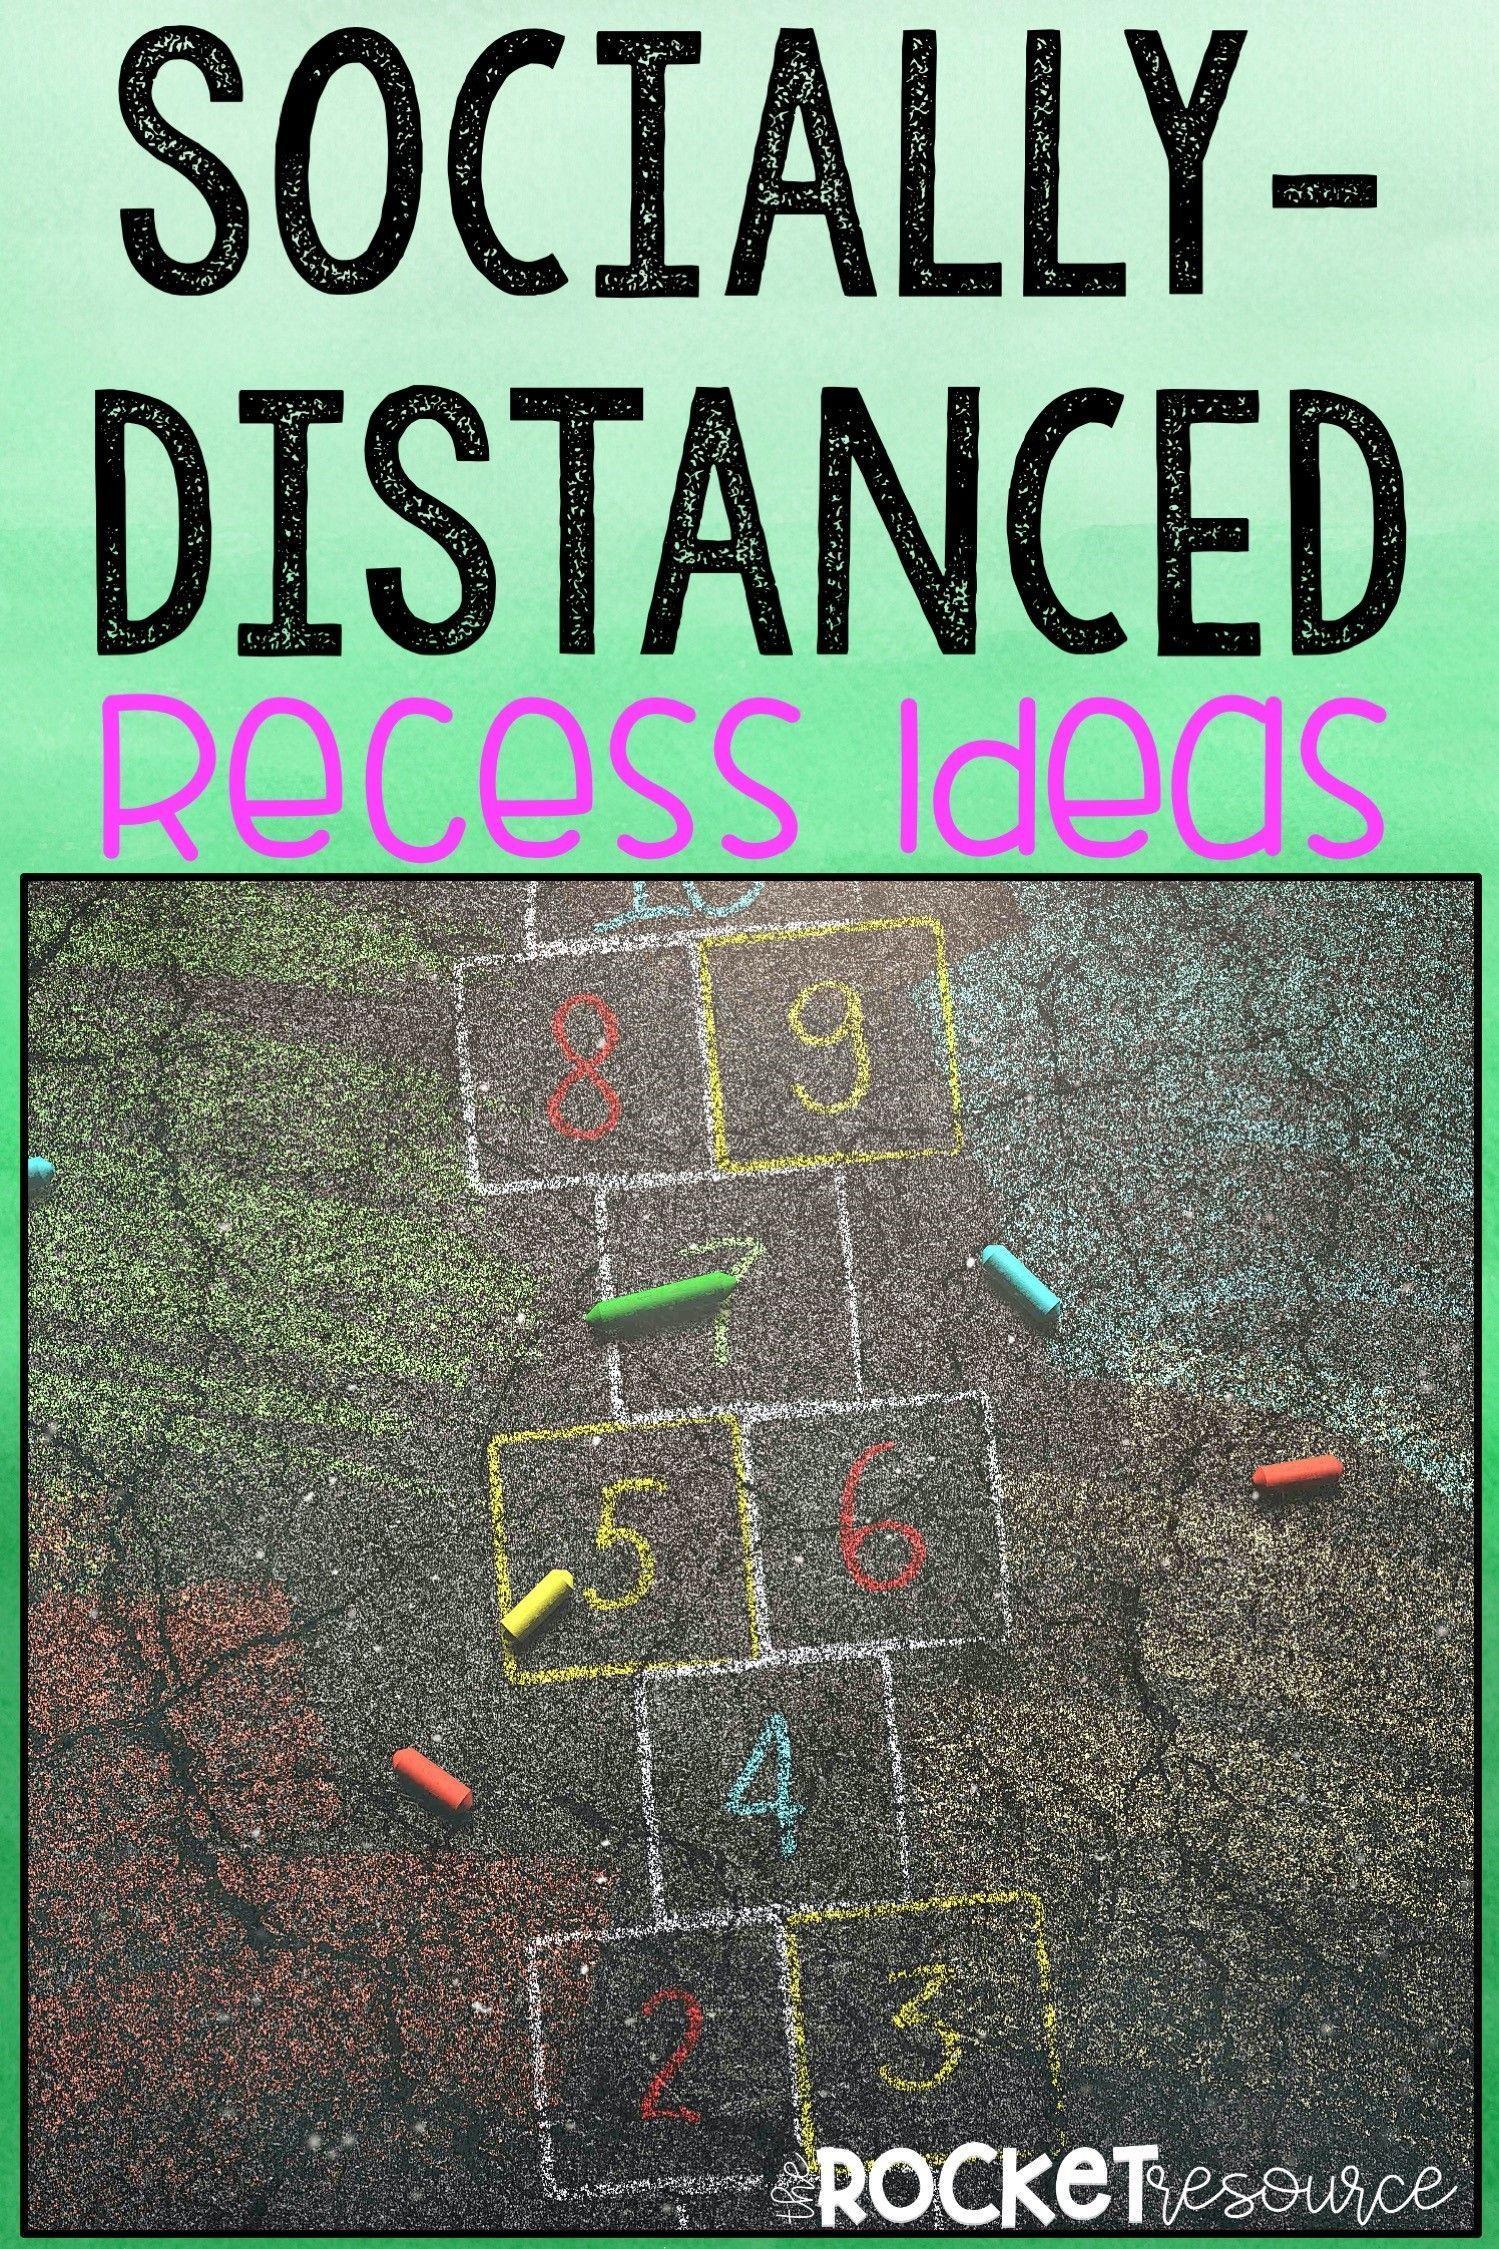 SociallyDistanced Recess Ideas The Rocket Resource in